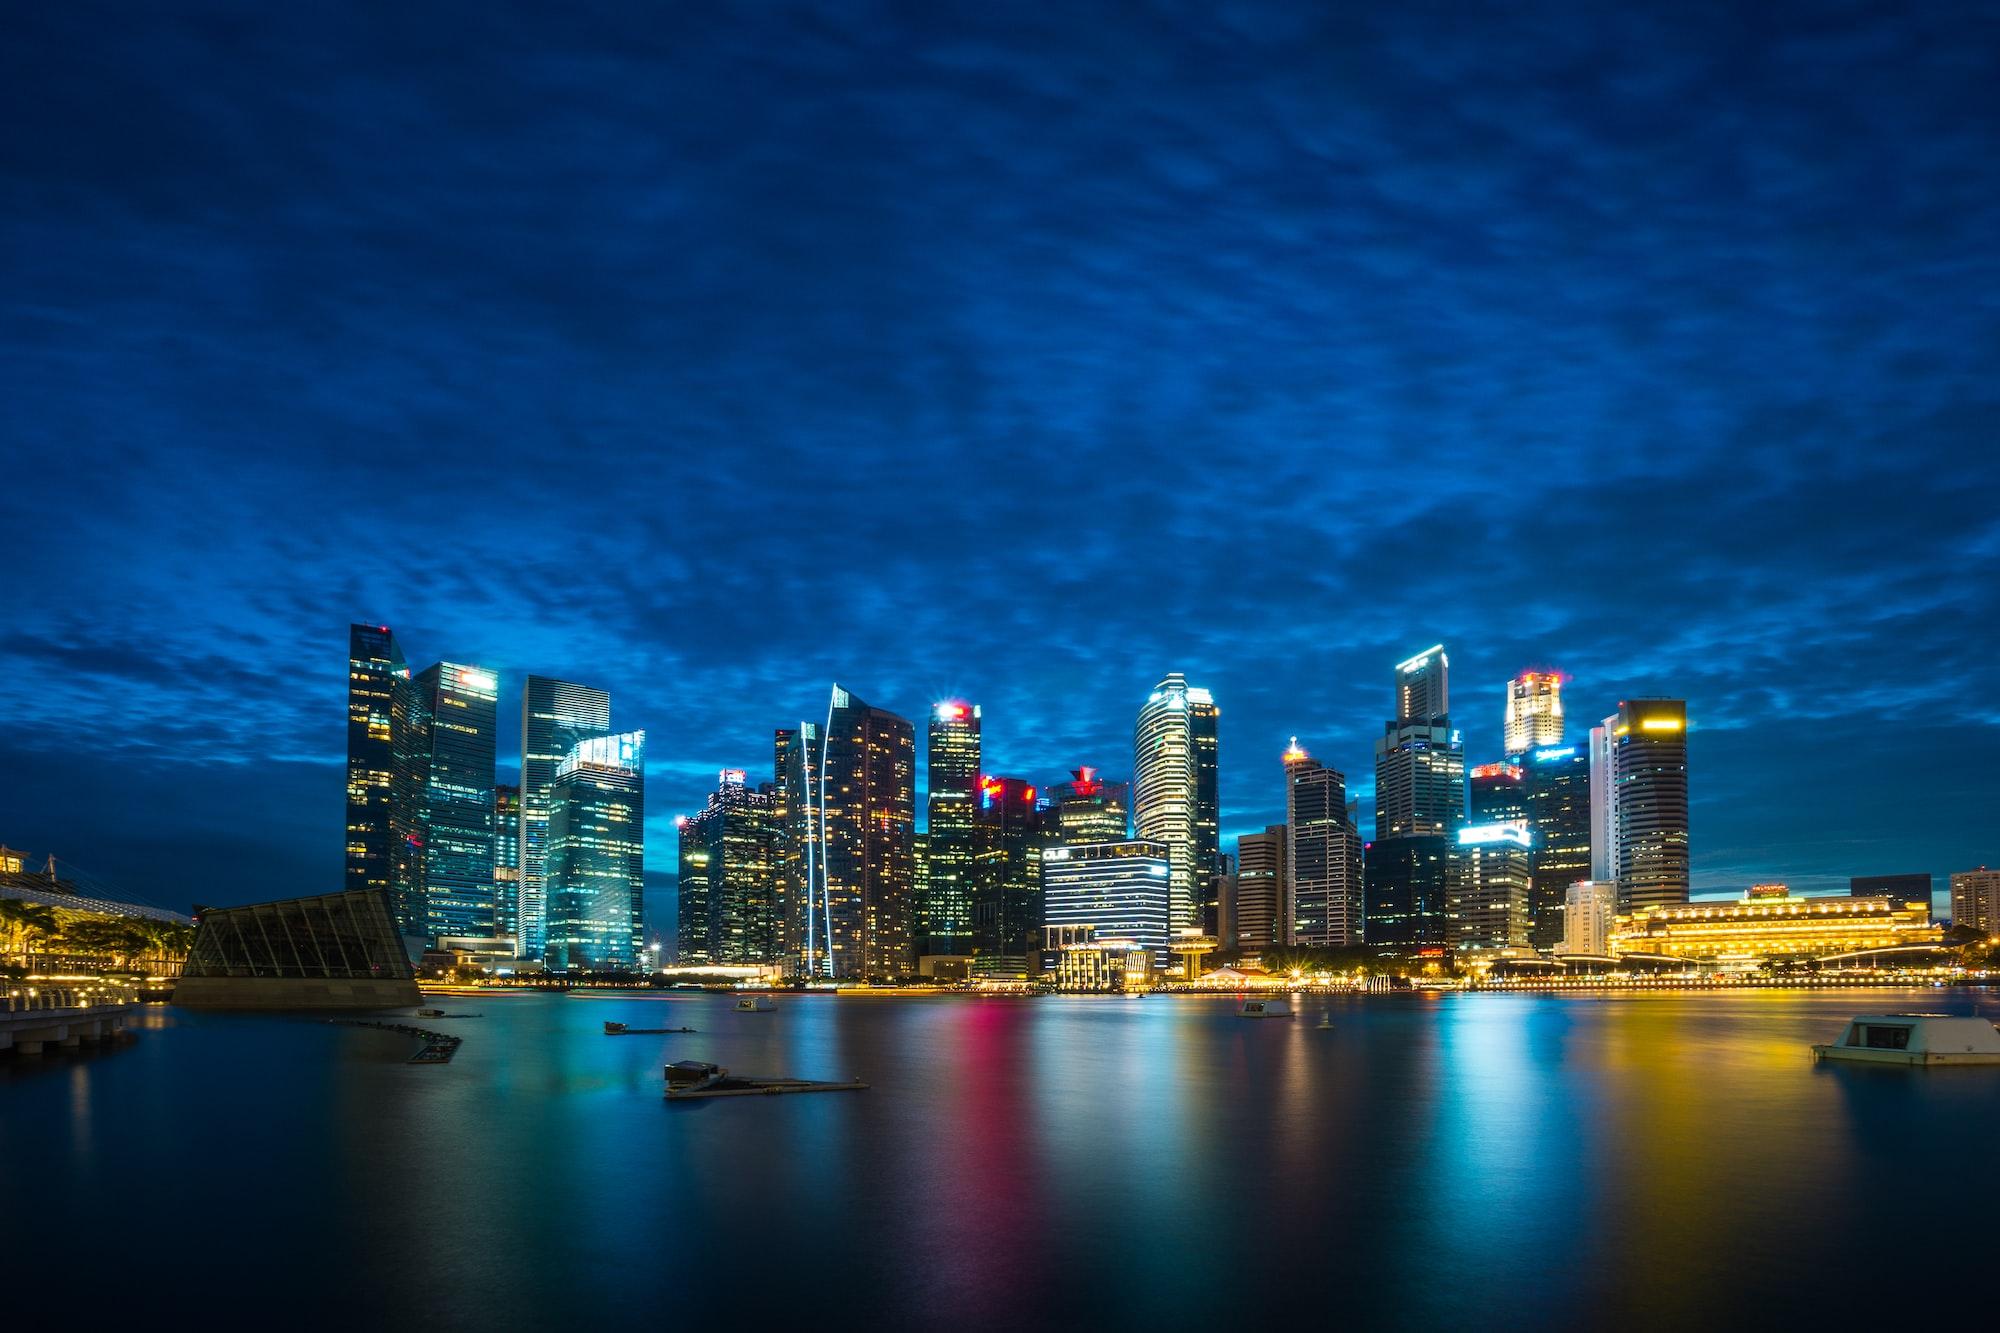 Understanding how Singapore unlocked its future as a technology hub